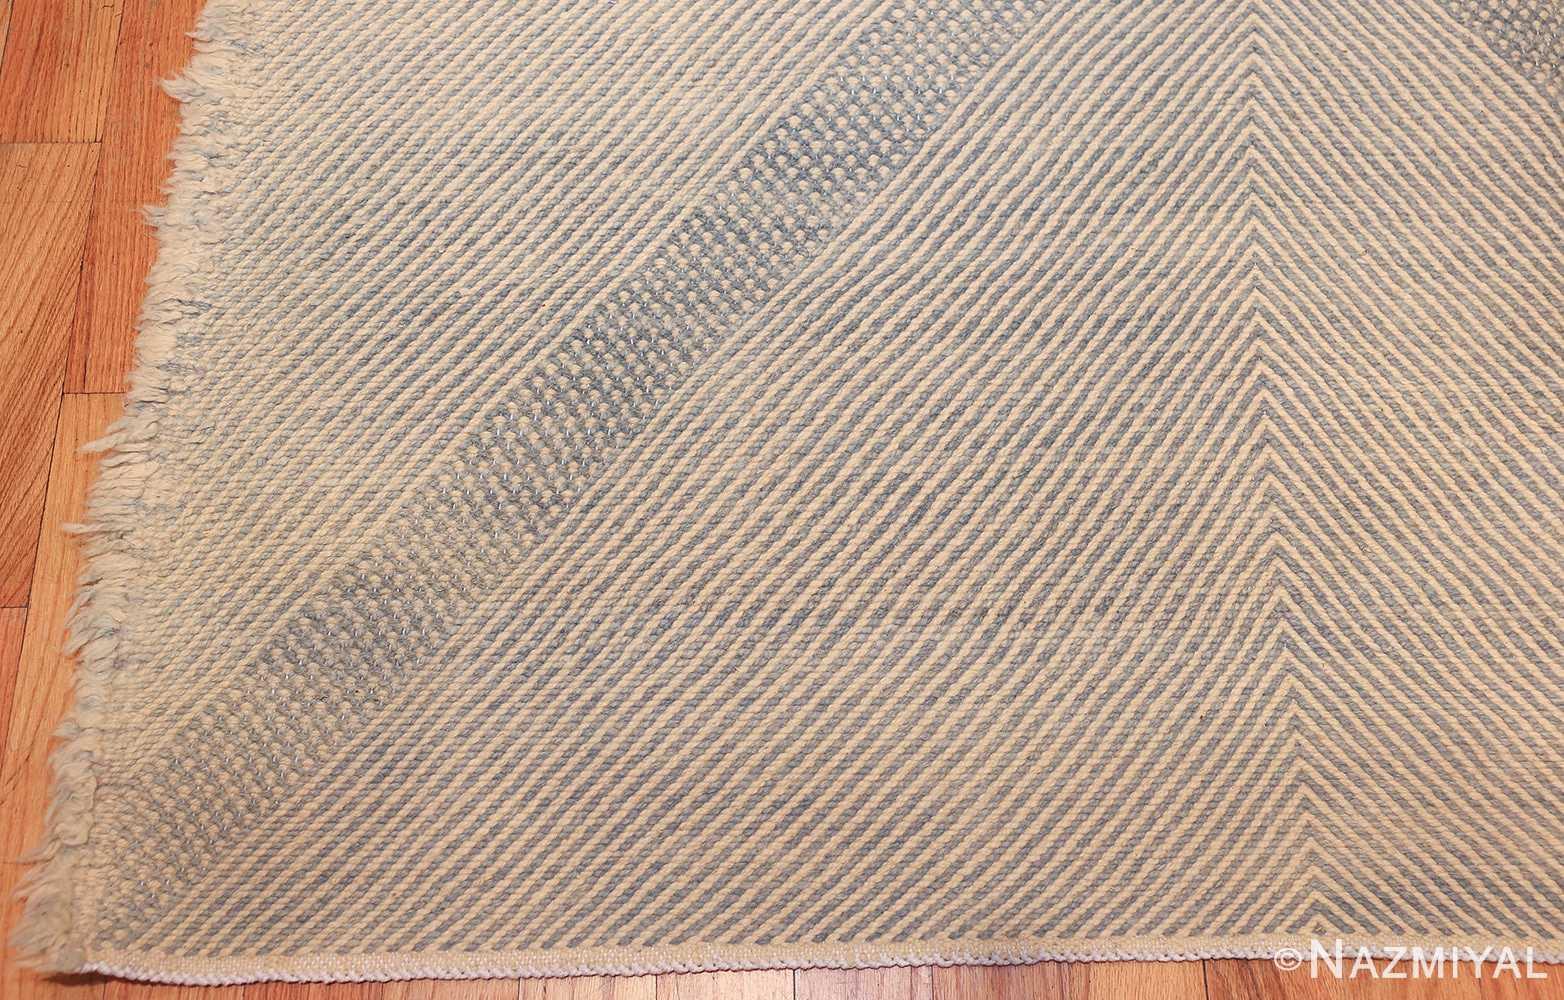 vintage moroccan rug 48351 corner Nazmiyal